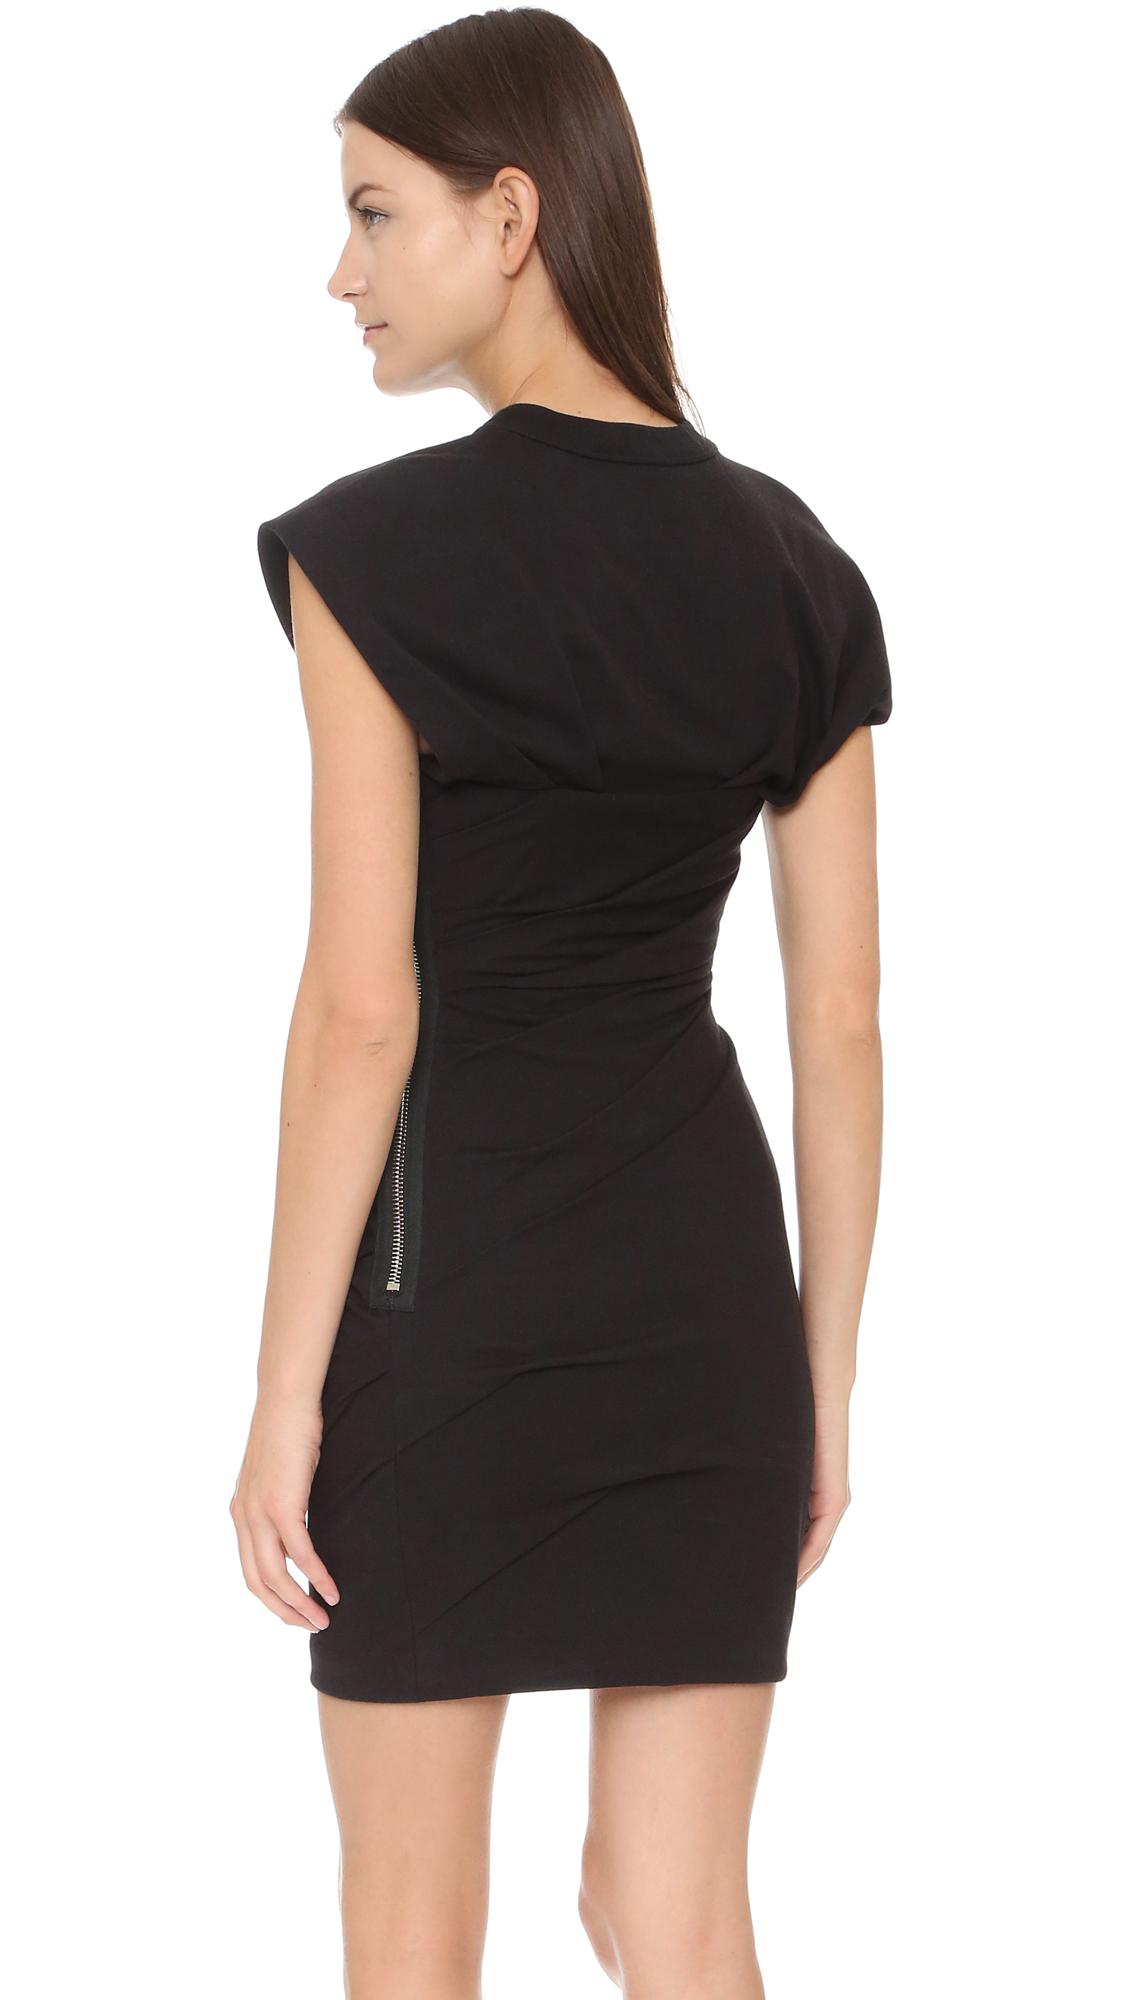 lyst alexander wang draped bustier t shirt dress in black